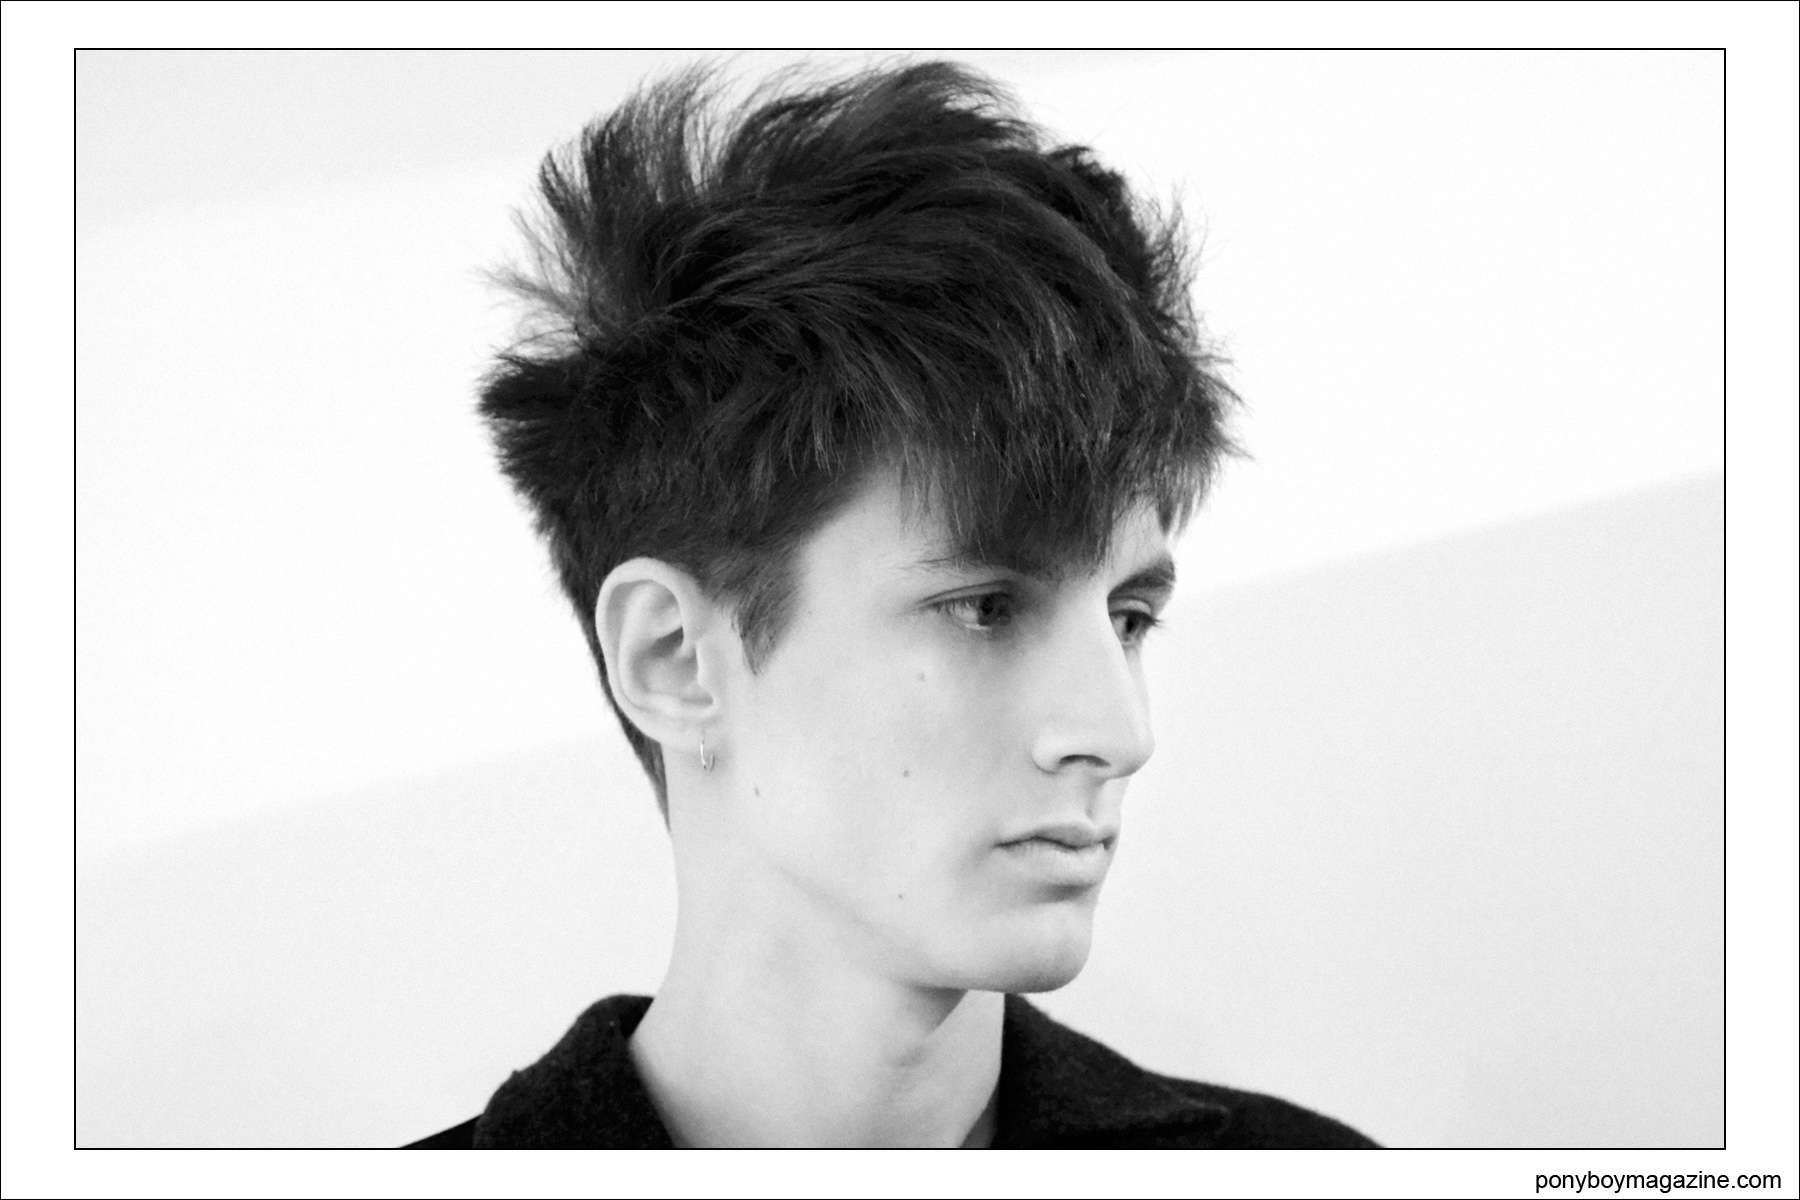 Portrait of model Henry Kitcher, backstage at Patrik Ervell S/S15 by Alexander Thompson for Ponyboy Magazine.